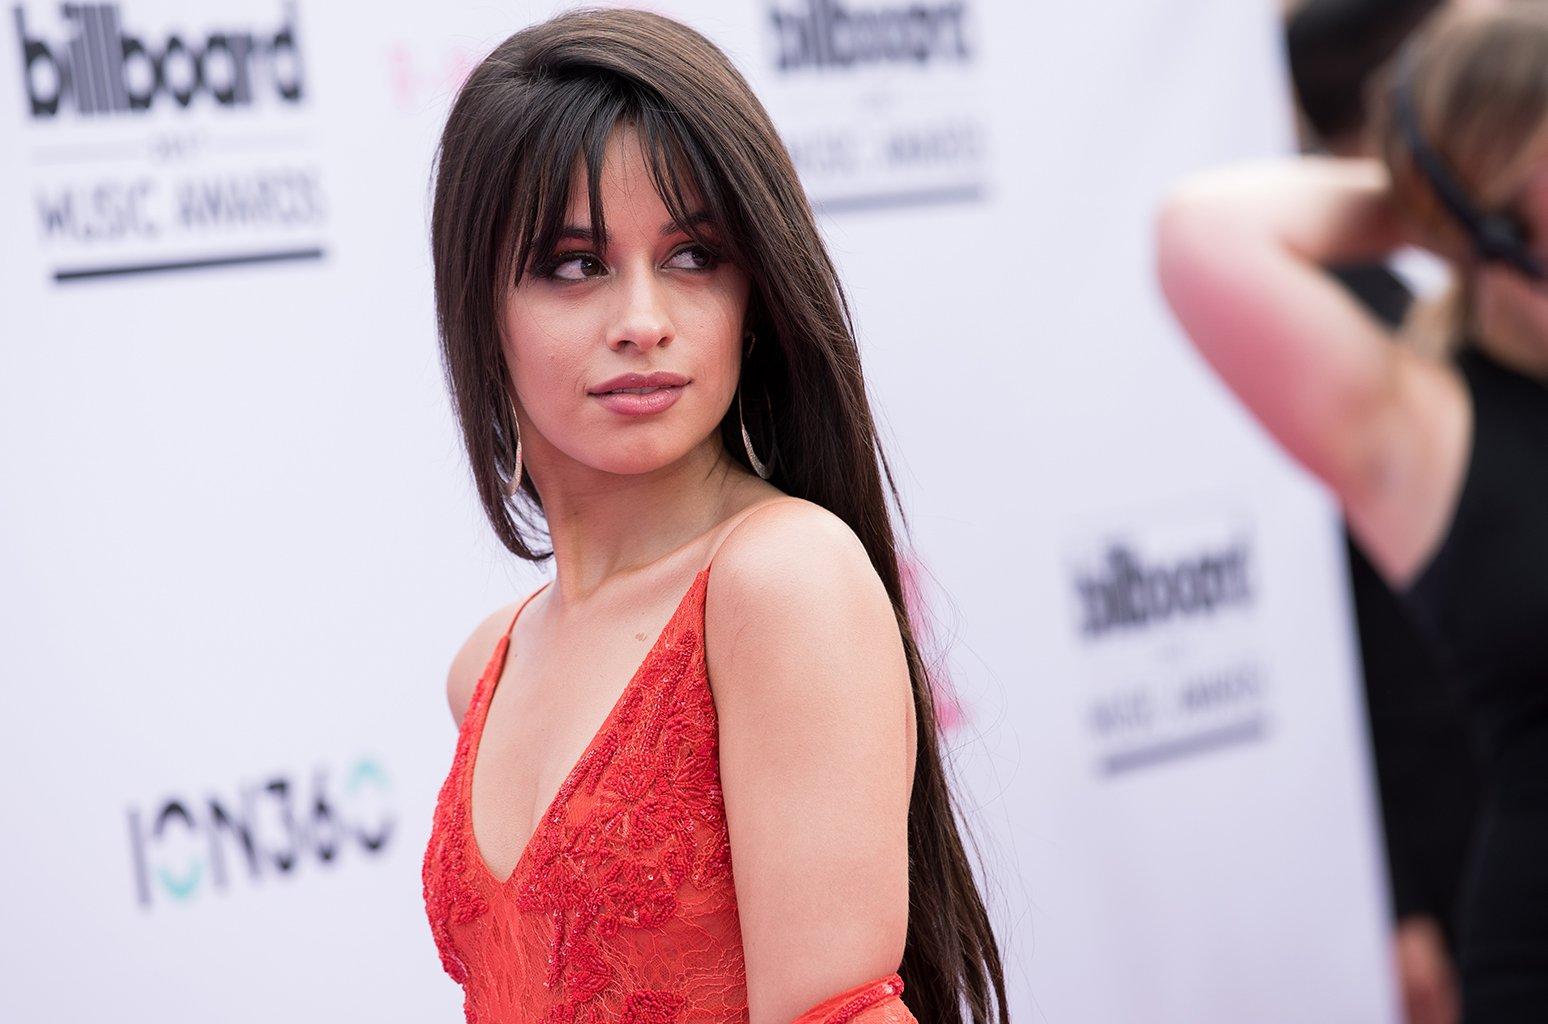 Camila Cabello announces Kane Brown remix of 'Never Be the Same' https://t.co/y2OkTf2sDz https://t.co/bkjTCwDkkh